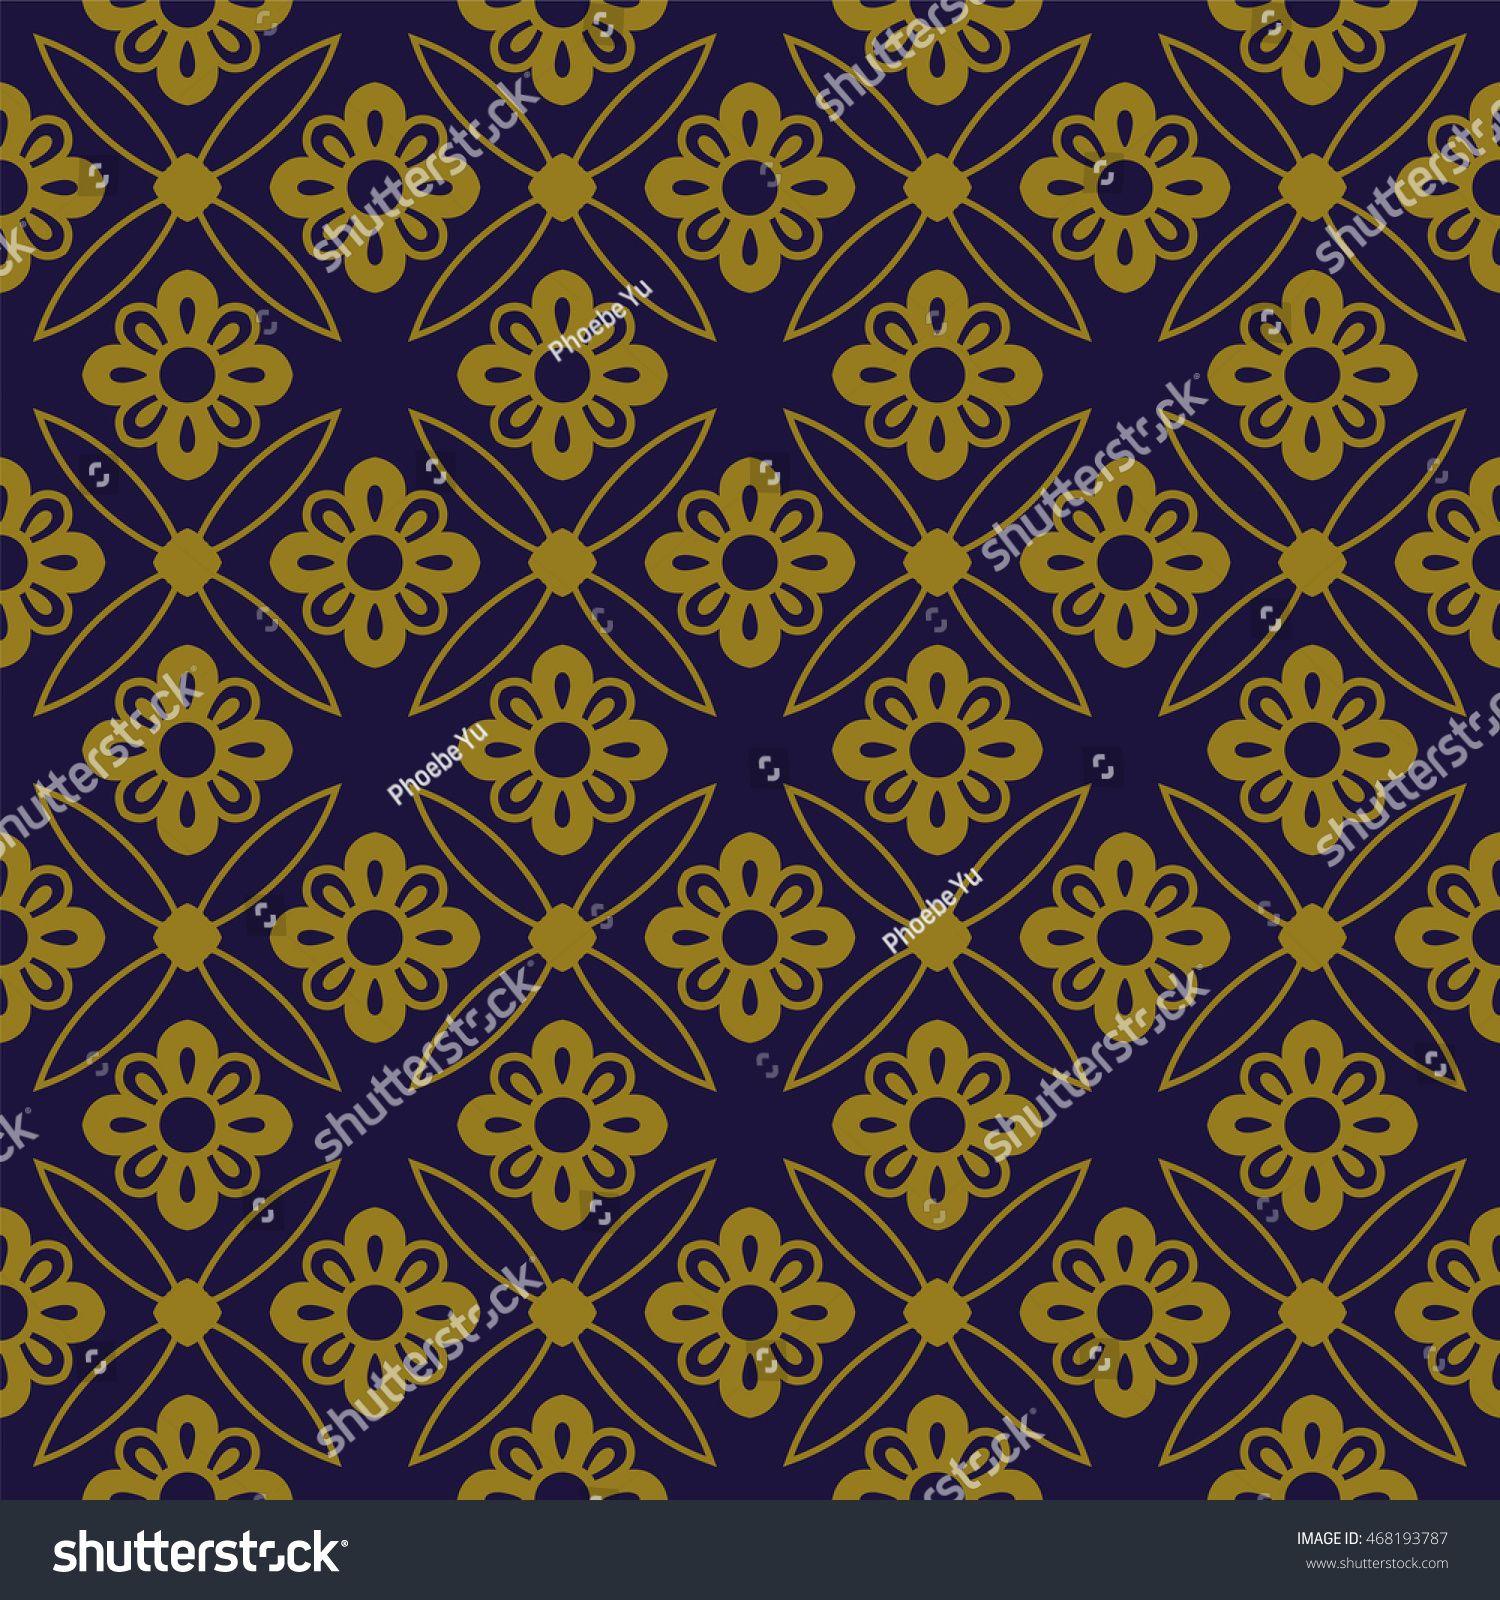 Antique Seamless Background 514 Vintage Cross Round Flower N Ad Paid Background Seamless Antique Flowern In 2020 Seamless Background Portfolio Website Vintage